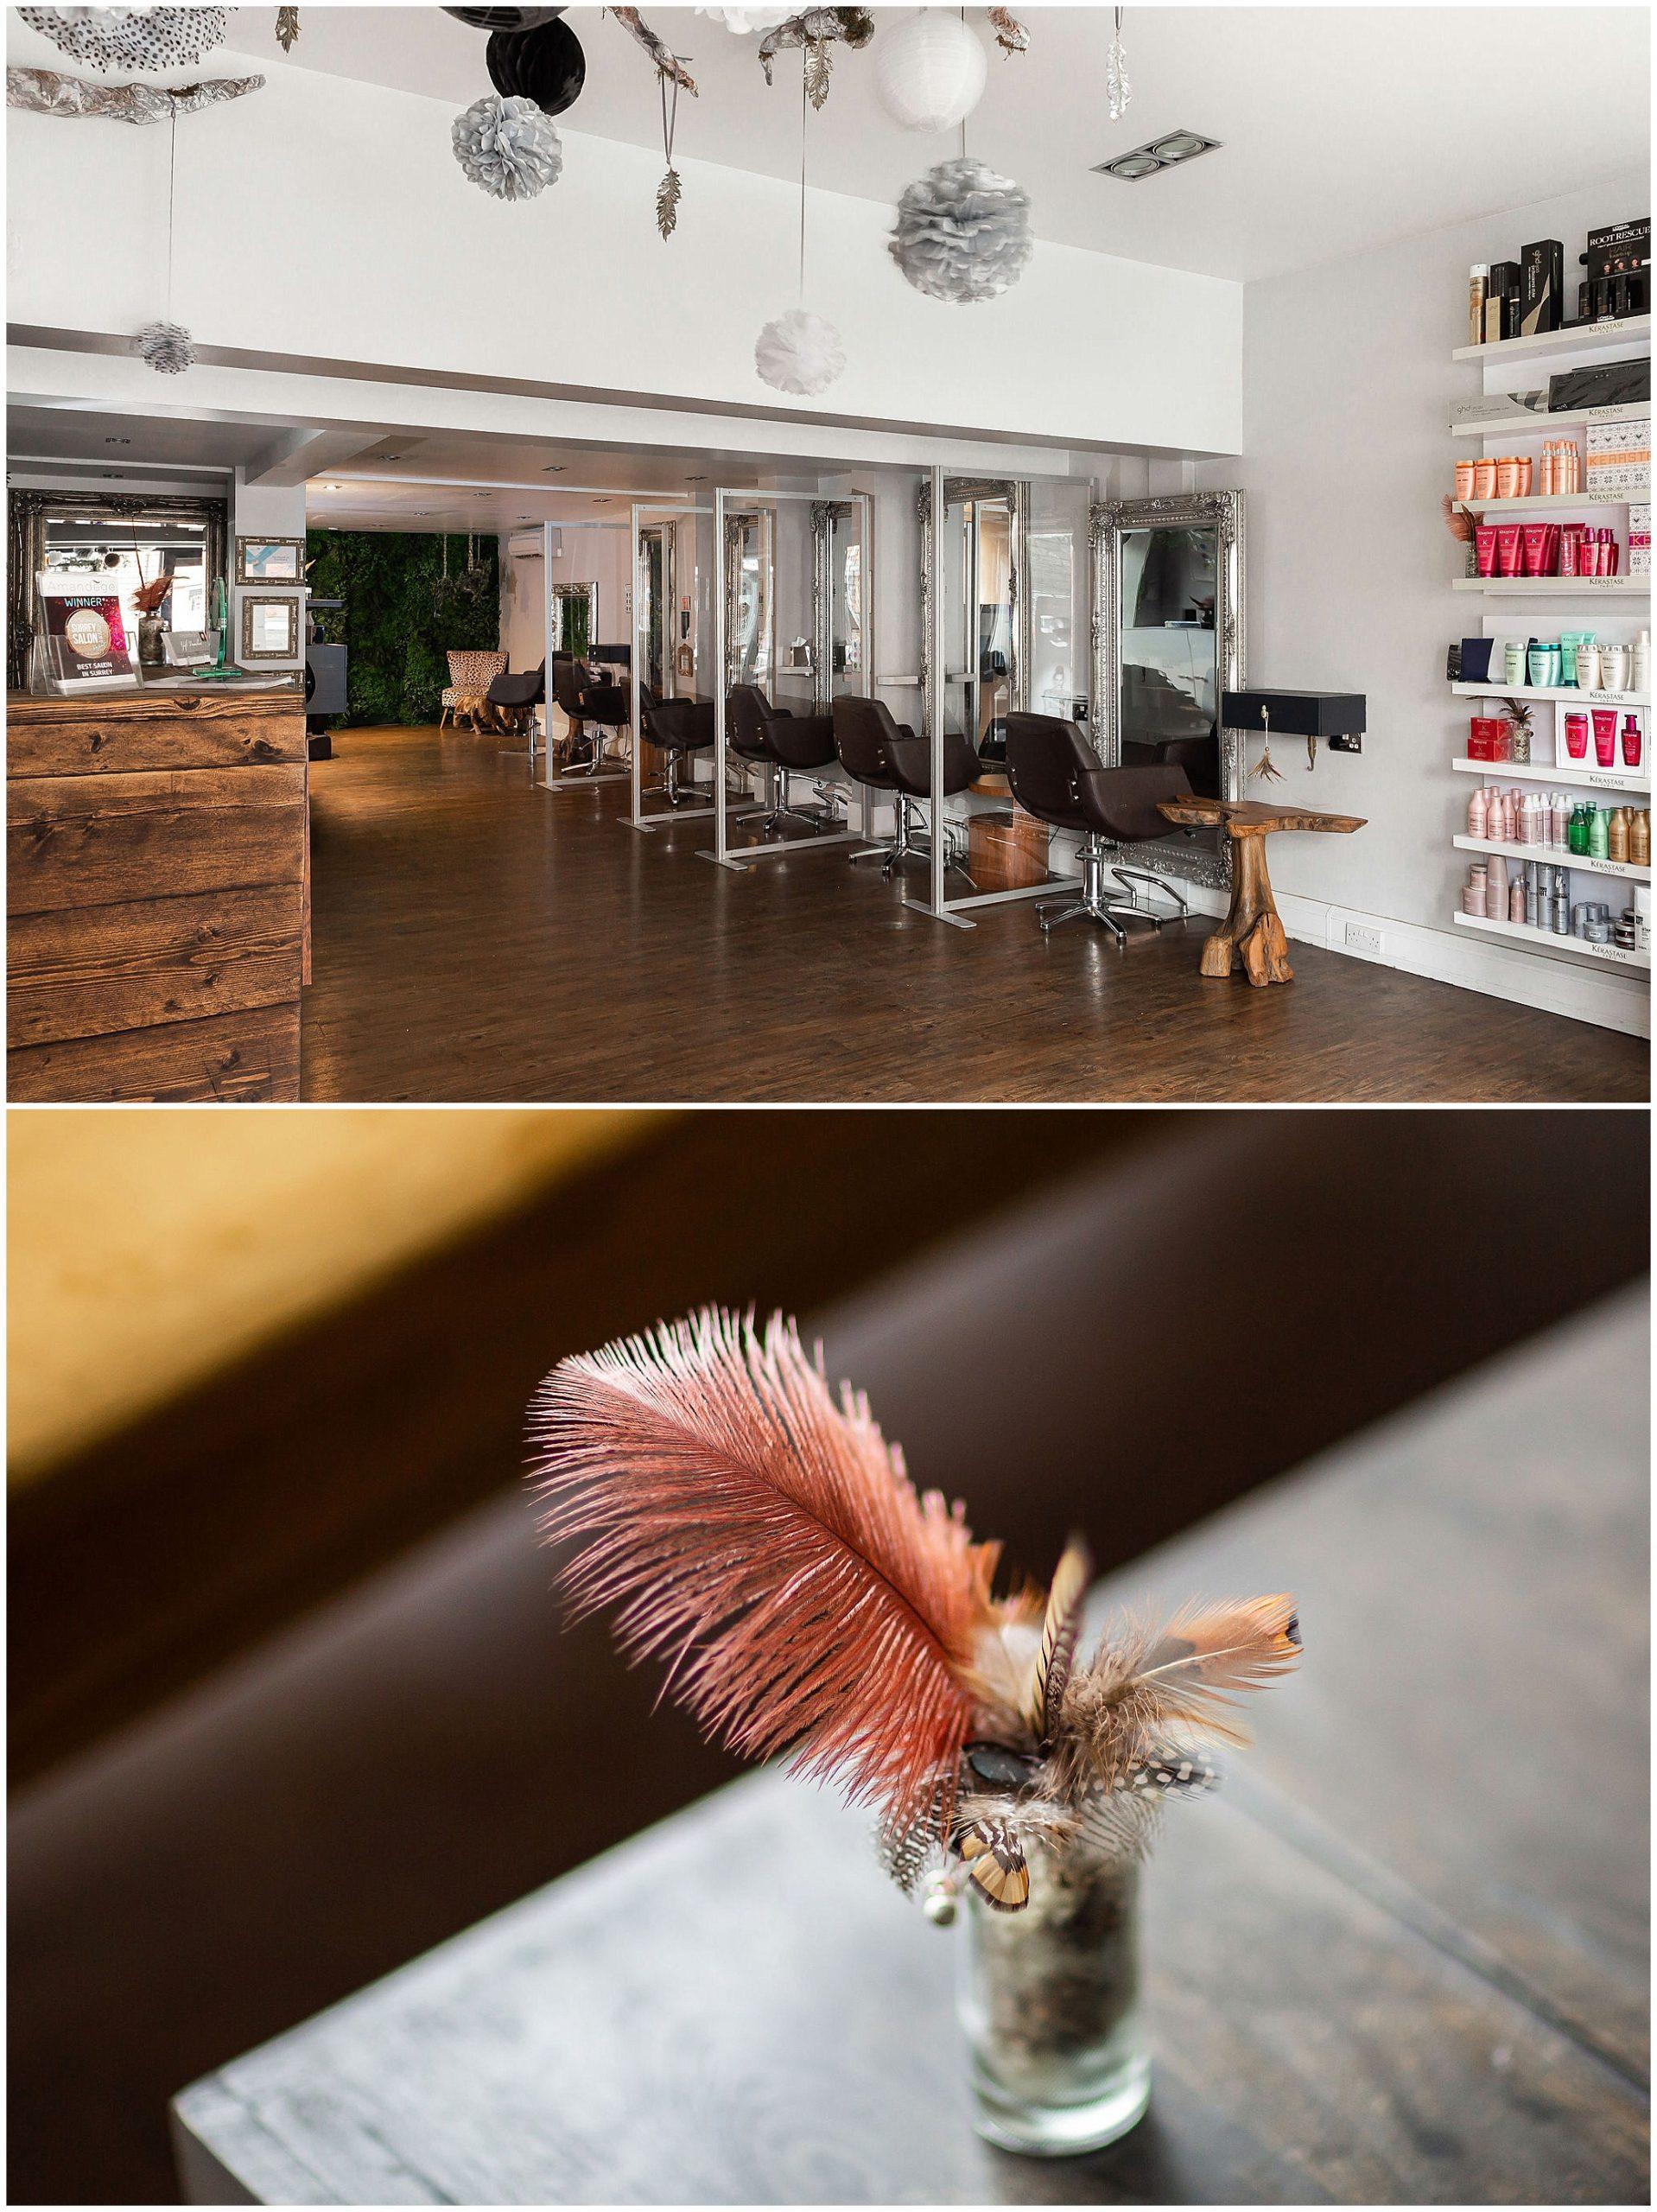 hair salon interior with feather detail Commercial photography Weybridge SurreyWeybridge